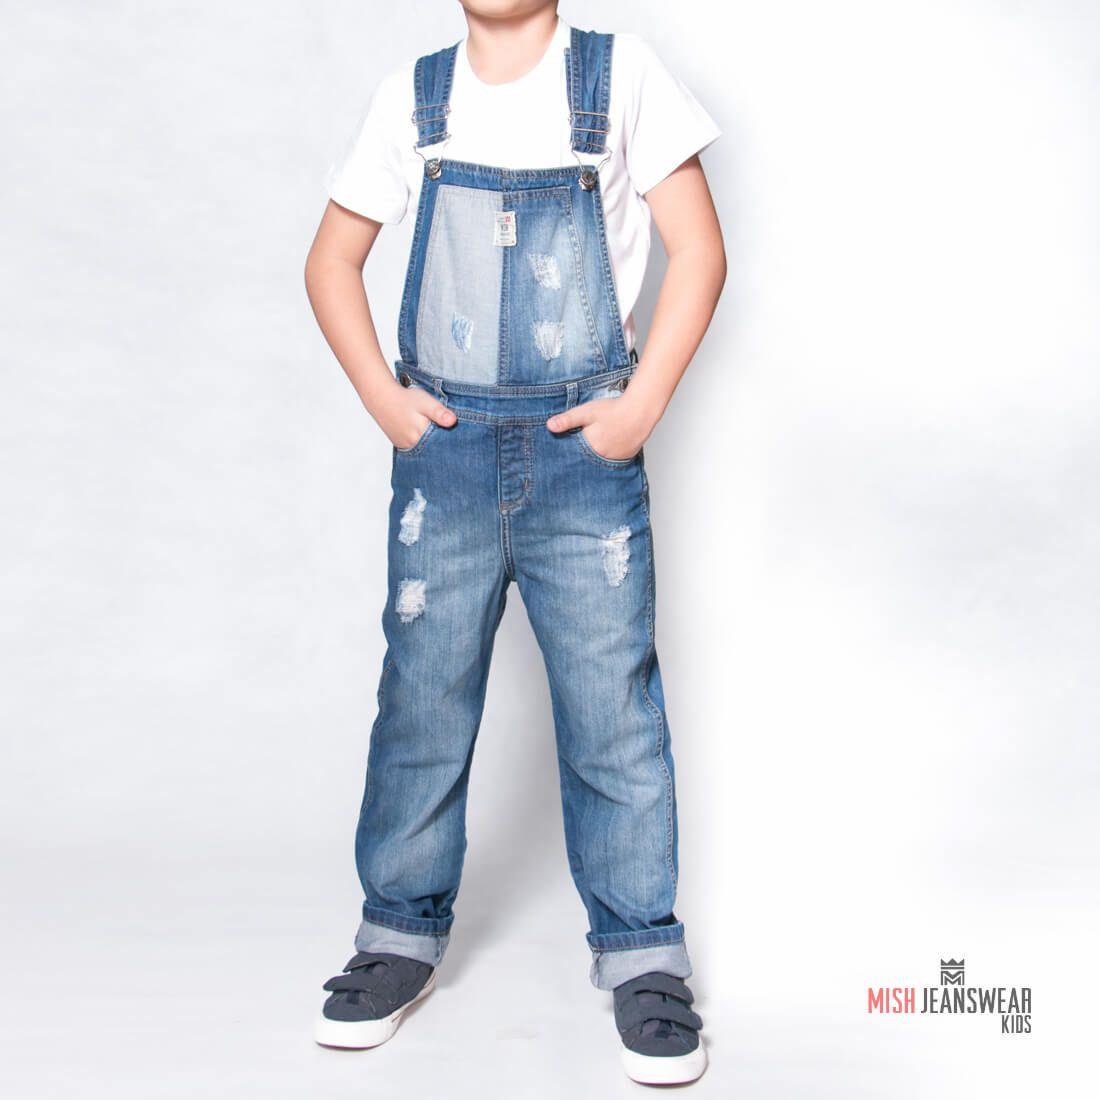 52a357ce1 Jardineira jeans infantil Mish masculina